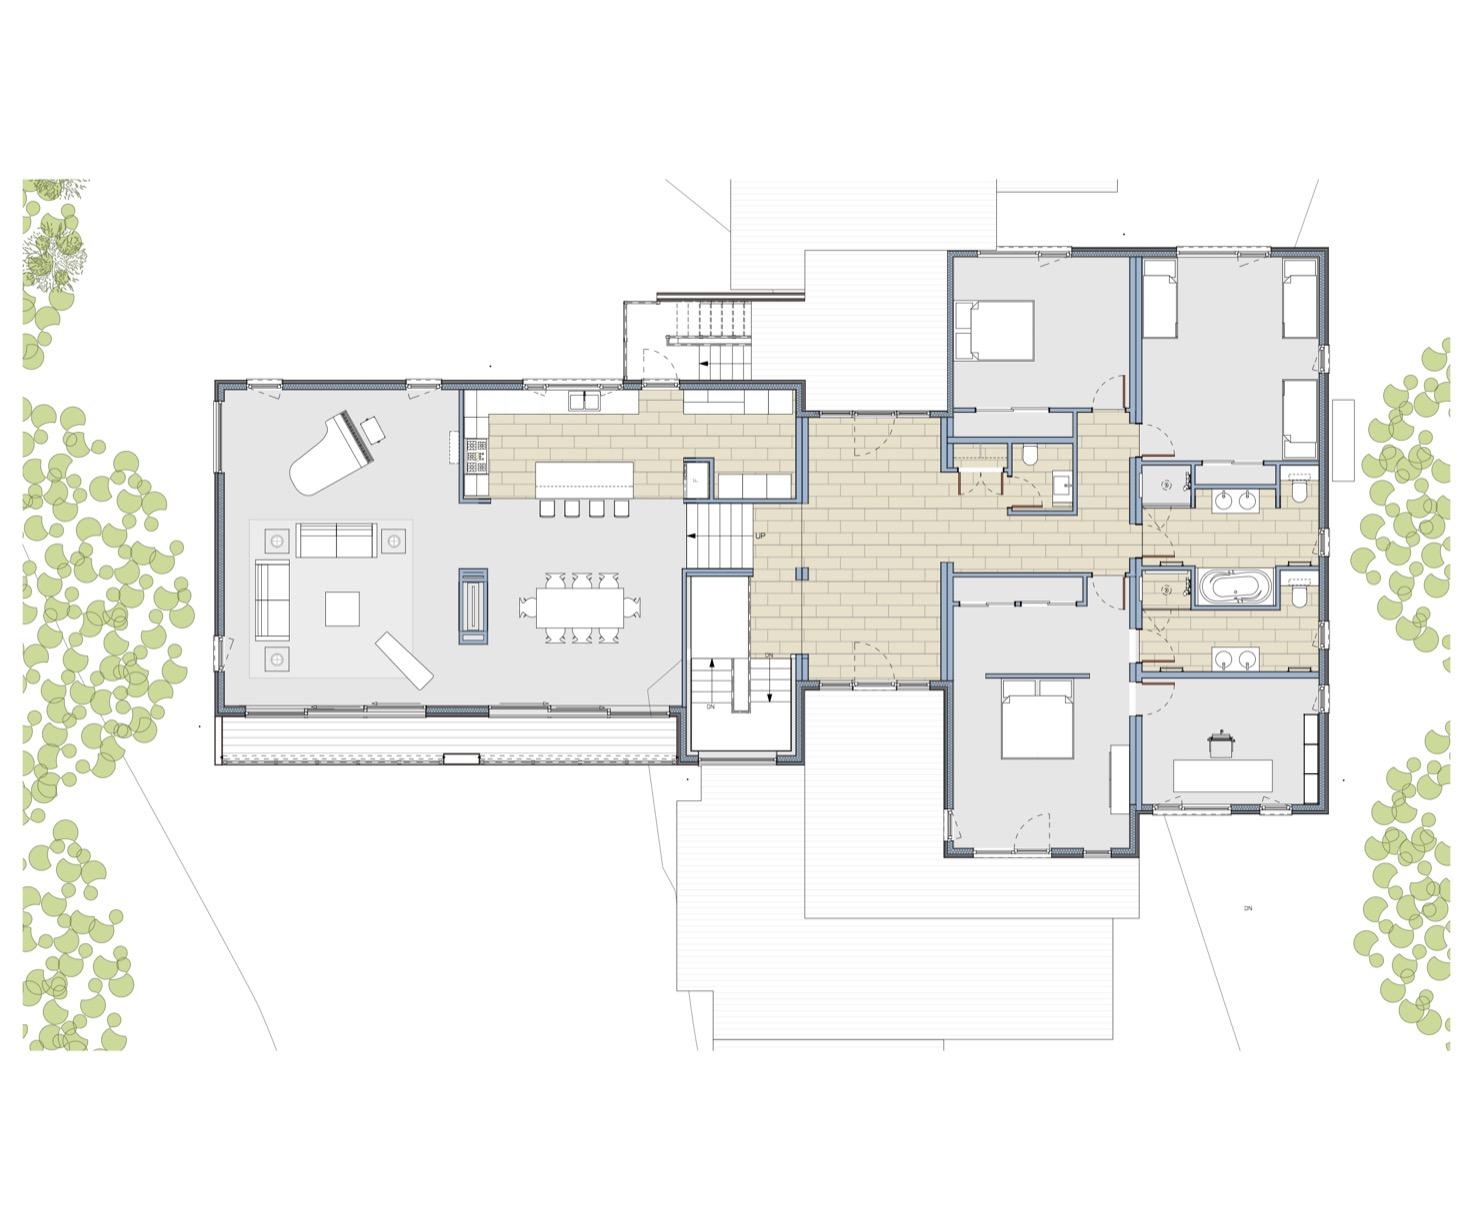 - Quick Facts:4,500 square feetSplit Level Design4 Bedrooms4 BathsLarge Media Room in lower level